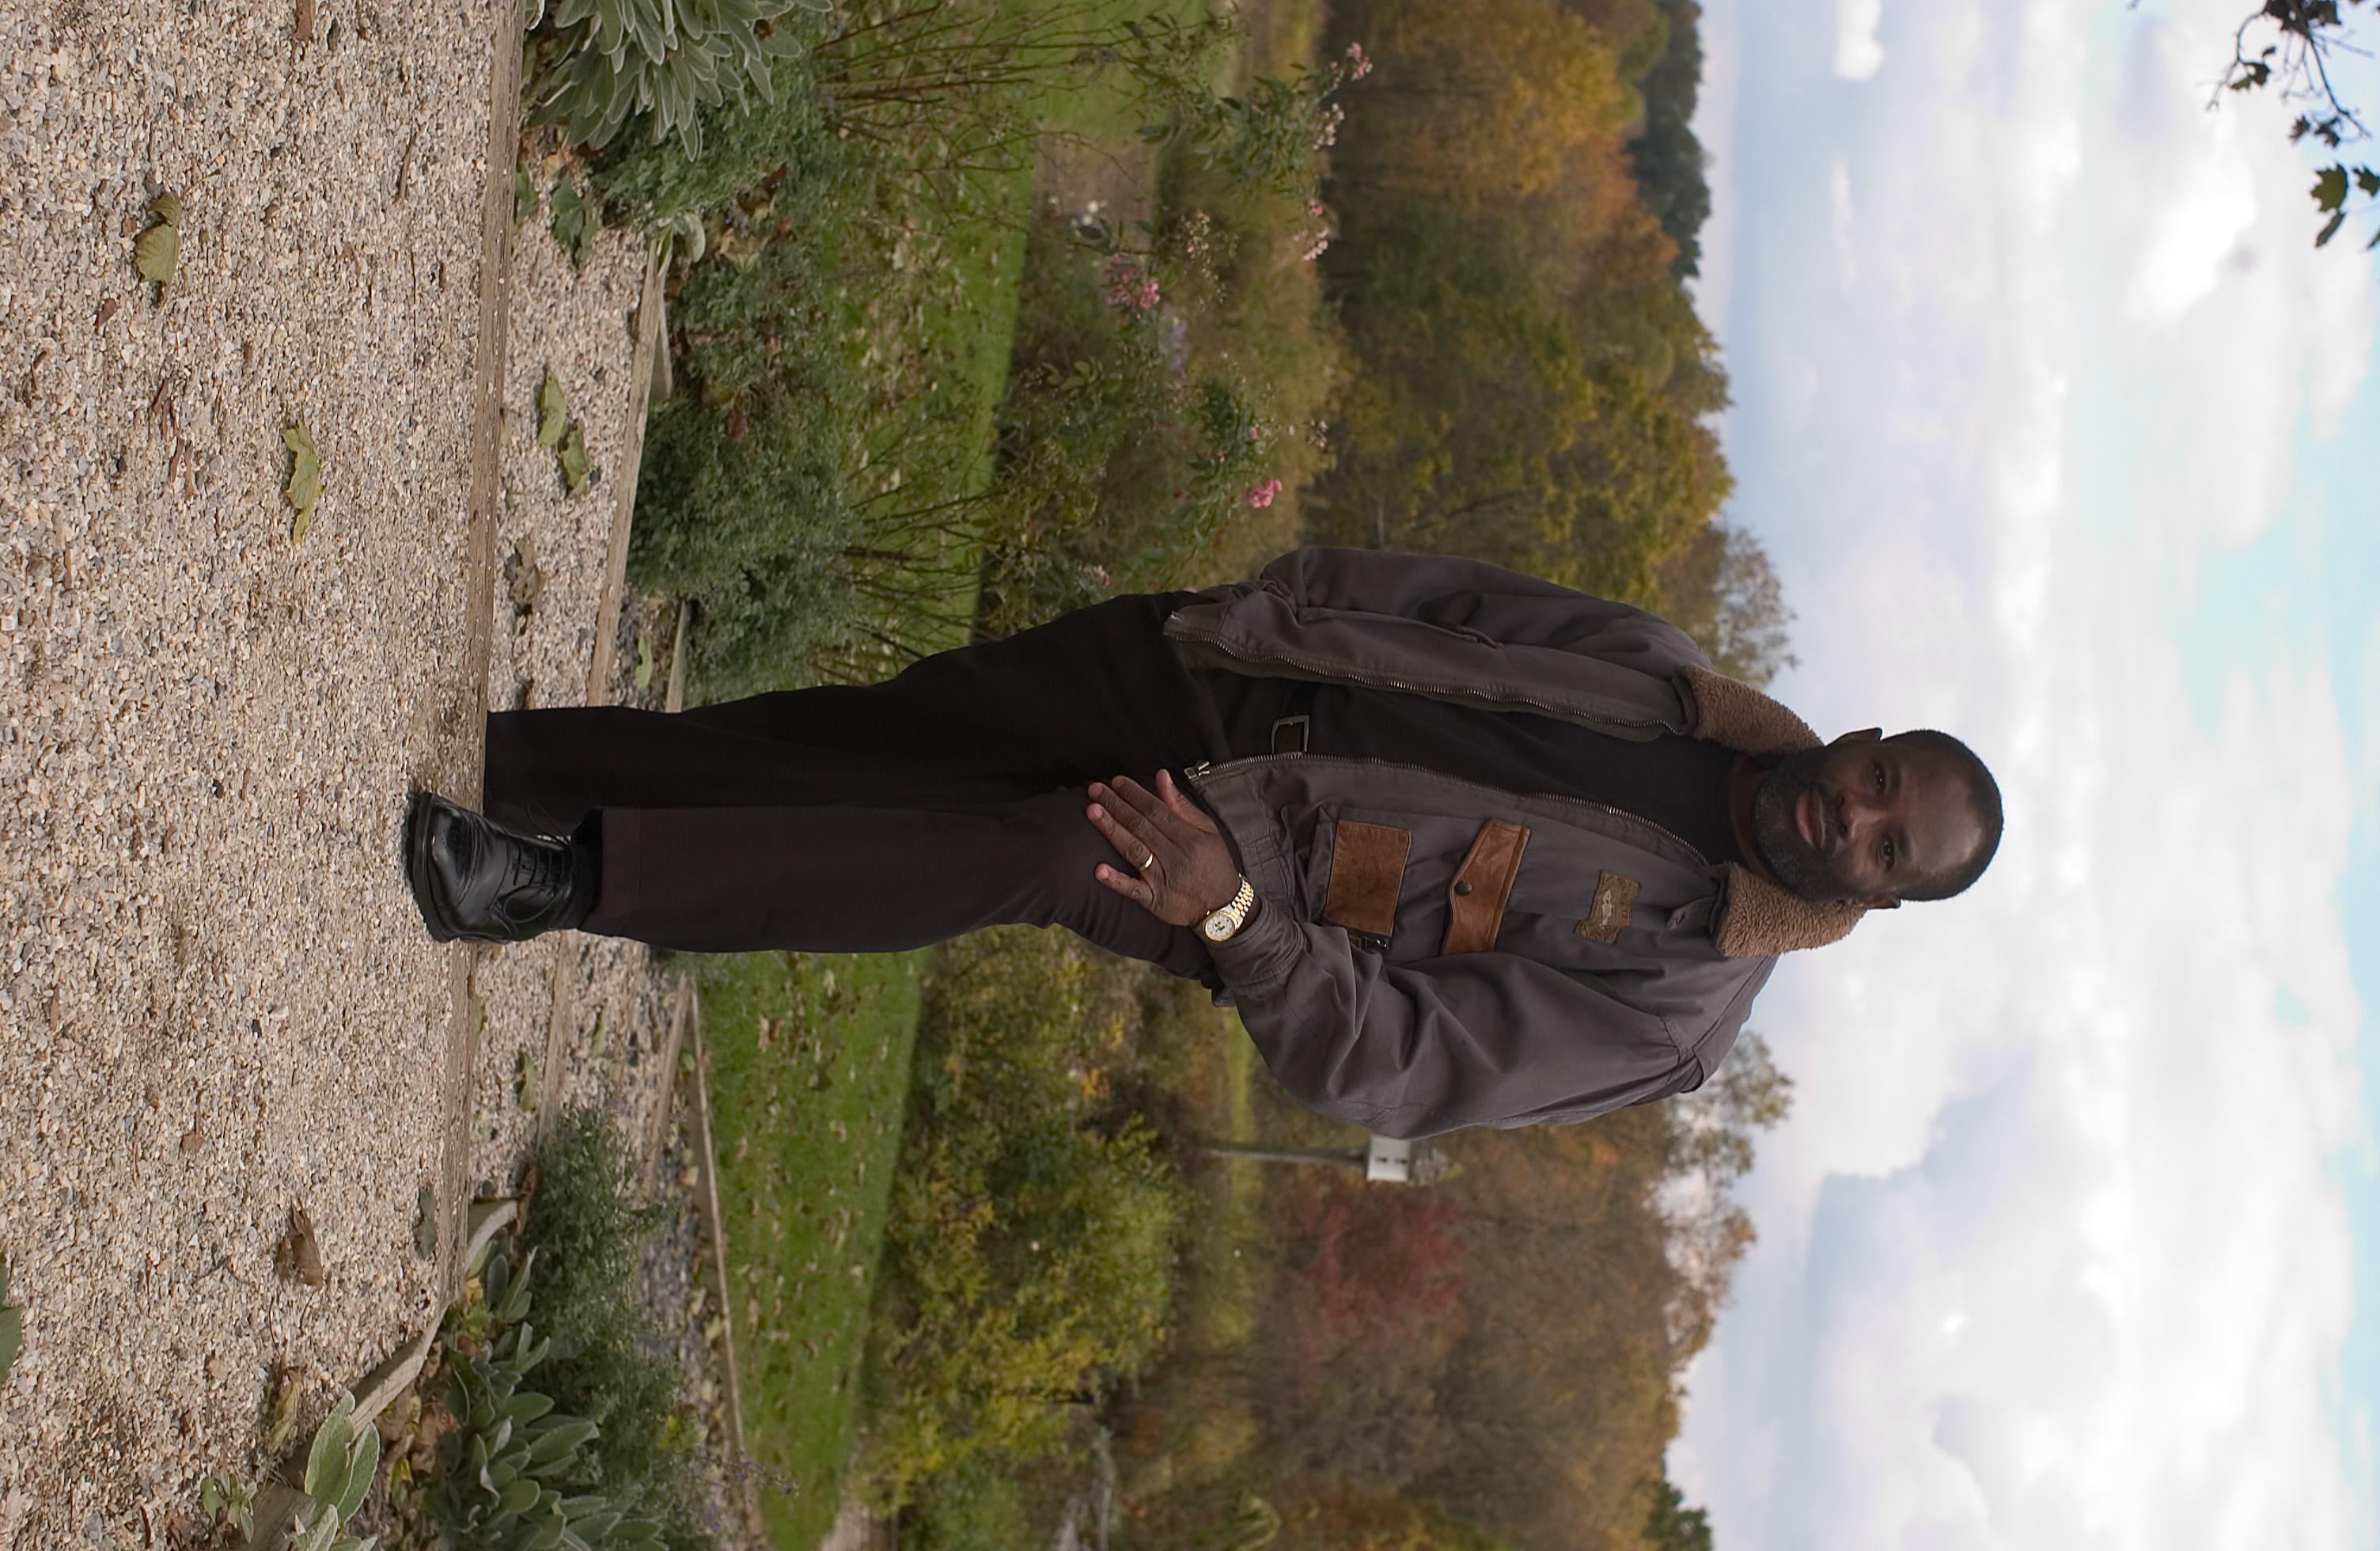 Emeagwali - October 29, 2005 - Maryland (Philip-Emeagwali-Ladew ...